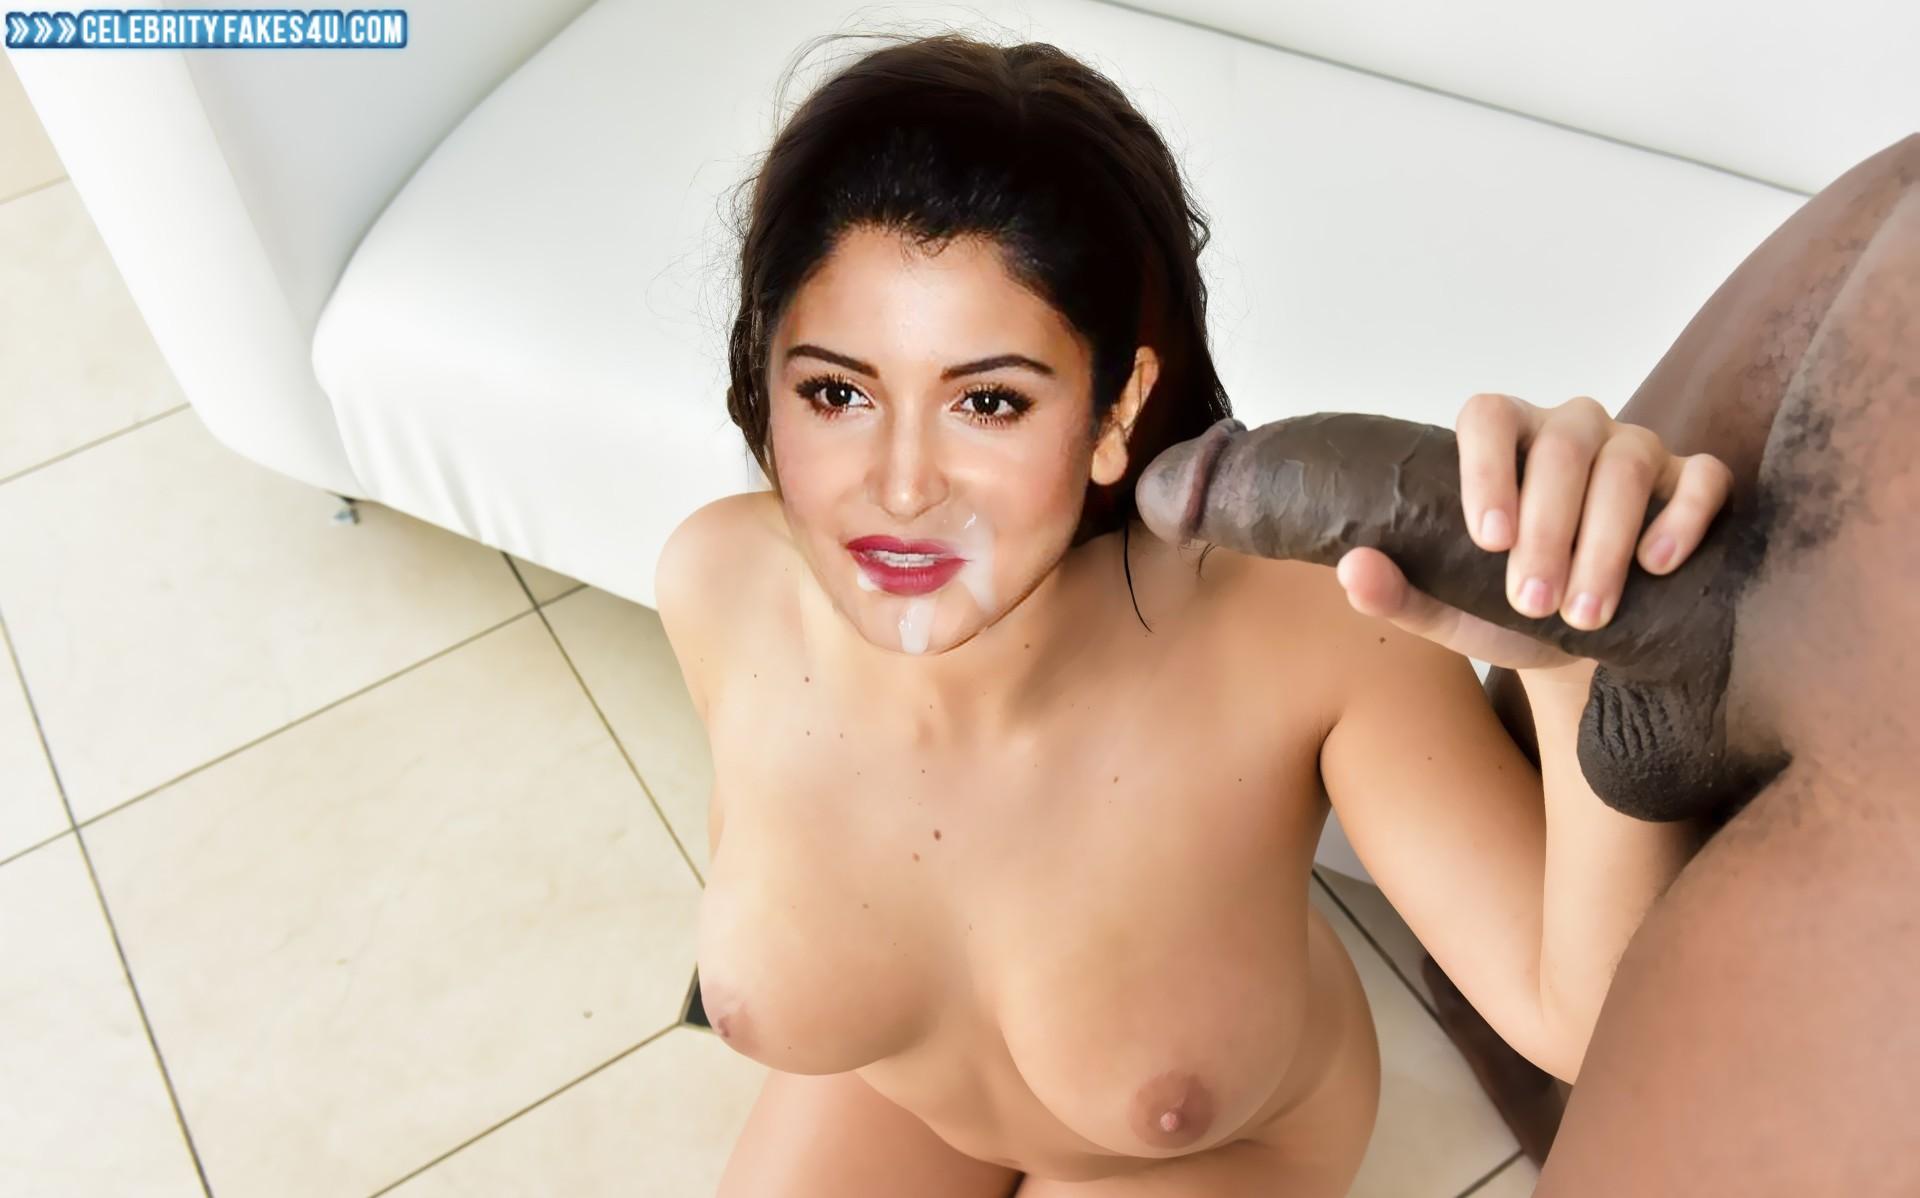 Nude arkansas self pics